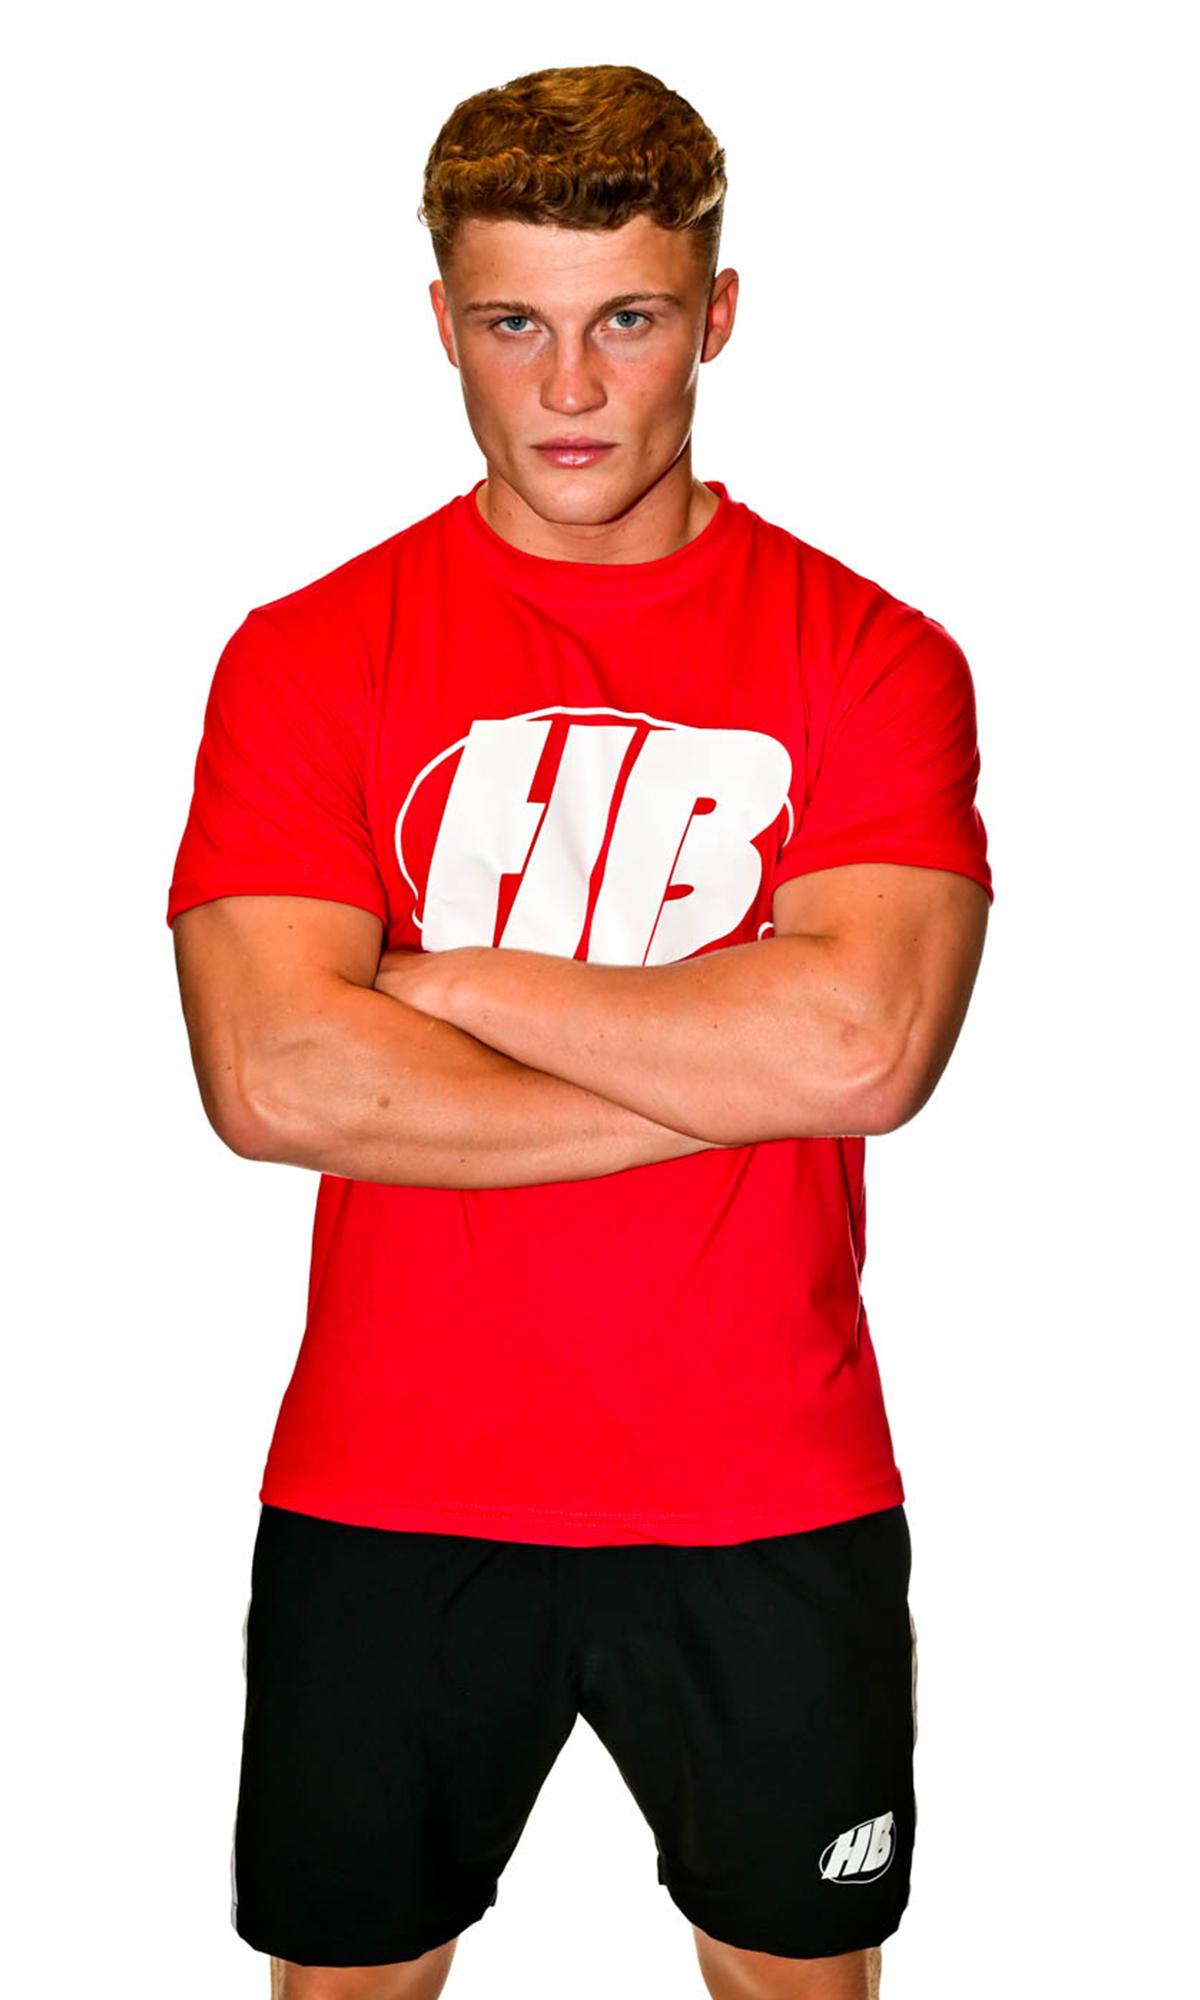 mens-red-tshirt-hb-fight